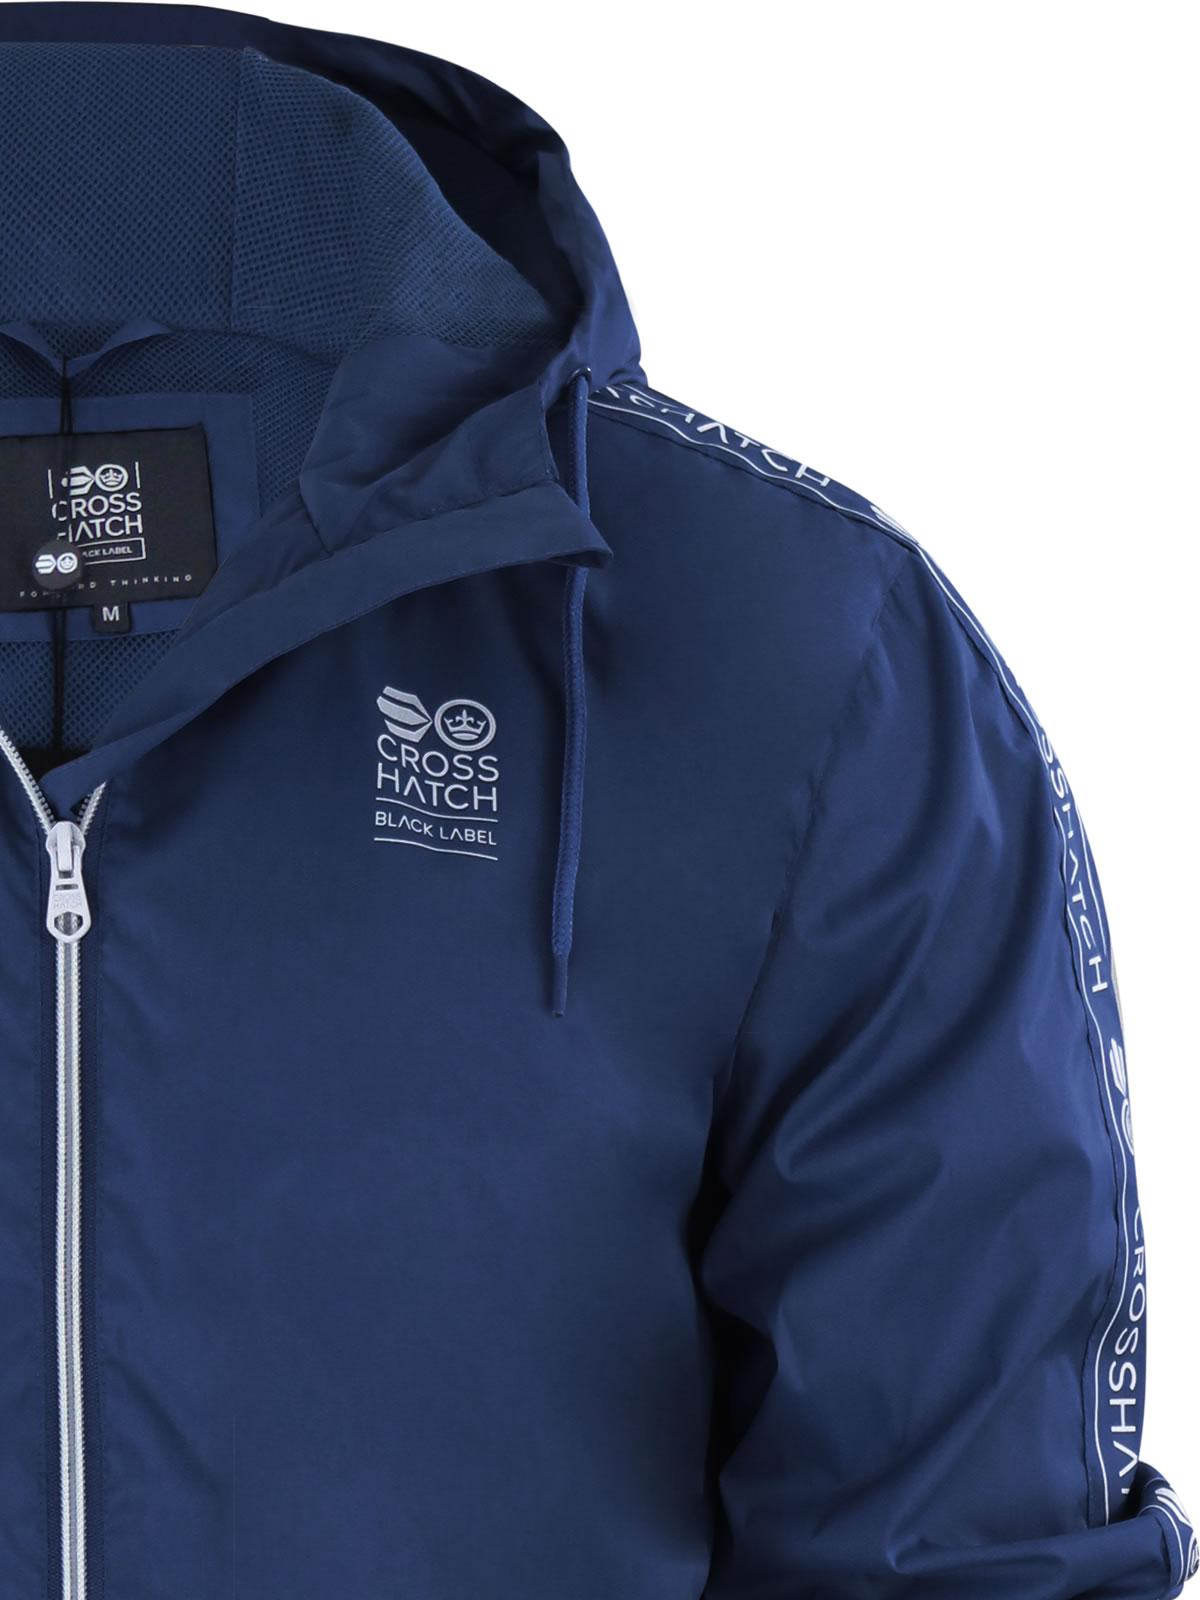 Mens Kagool Jacket Crosshatch Tabor Festival Hooded Rain Mac With ... 768a8302cb